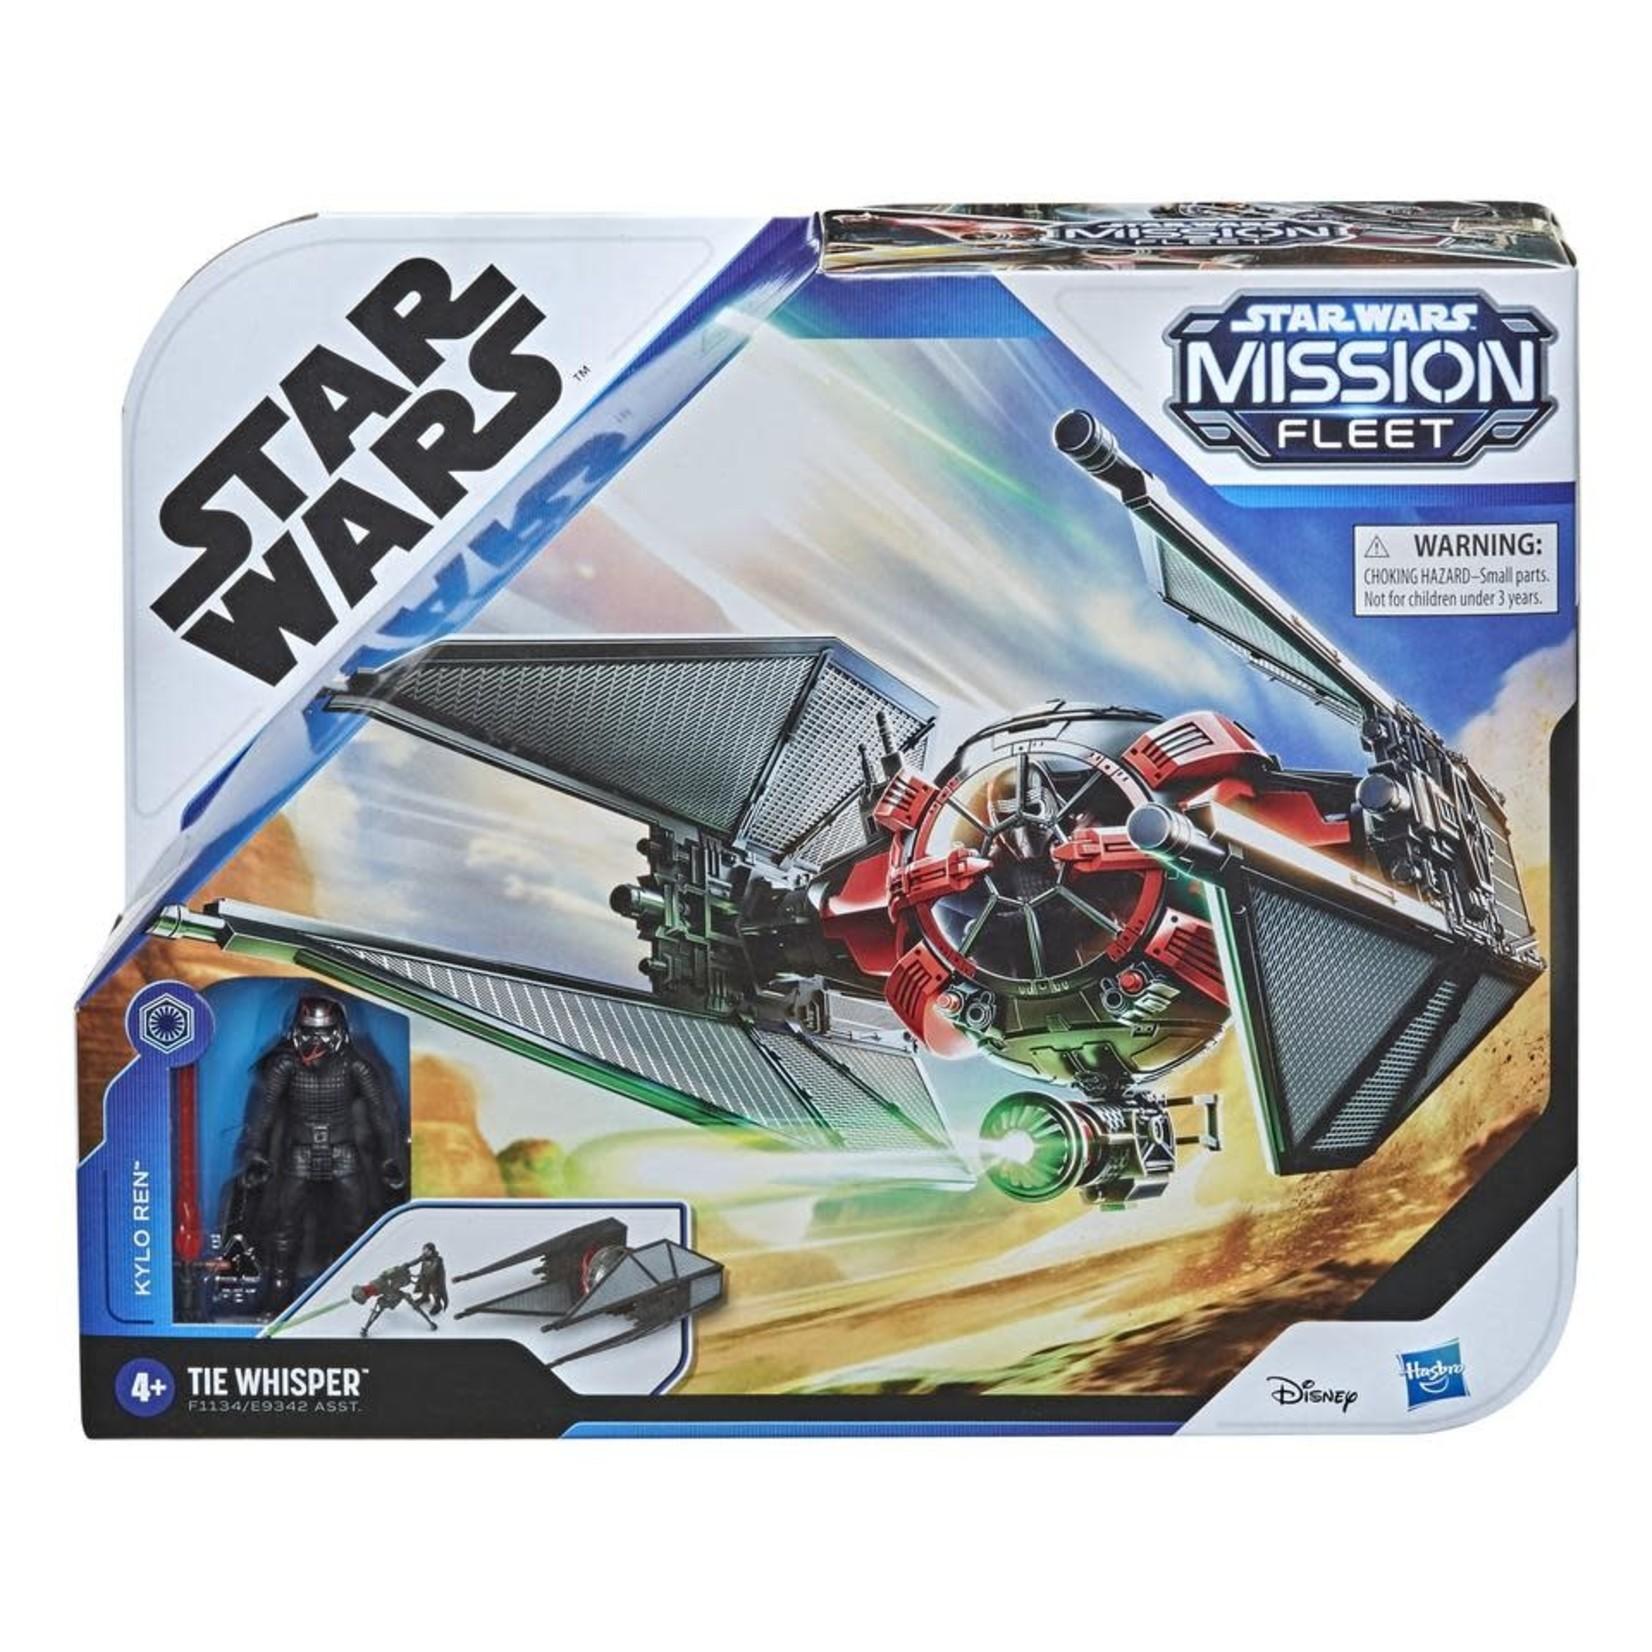 Hasbro Star Wars Mission Fleet Stellar Class Kylo Ren TIE Whisper